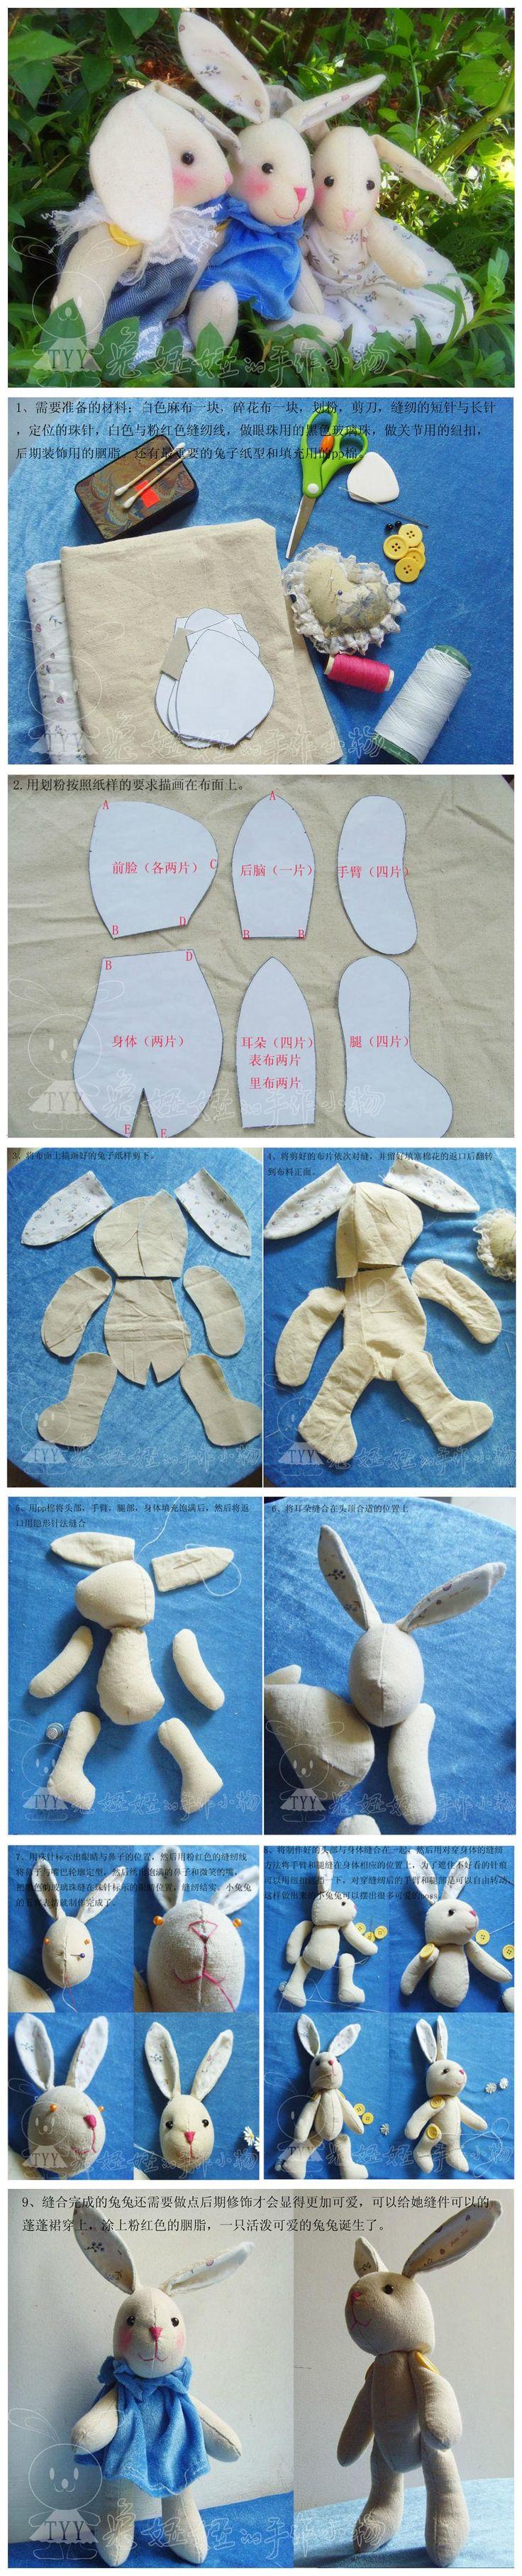 Tutorial on making bunnies